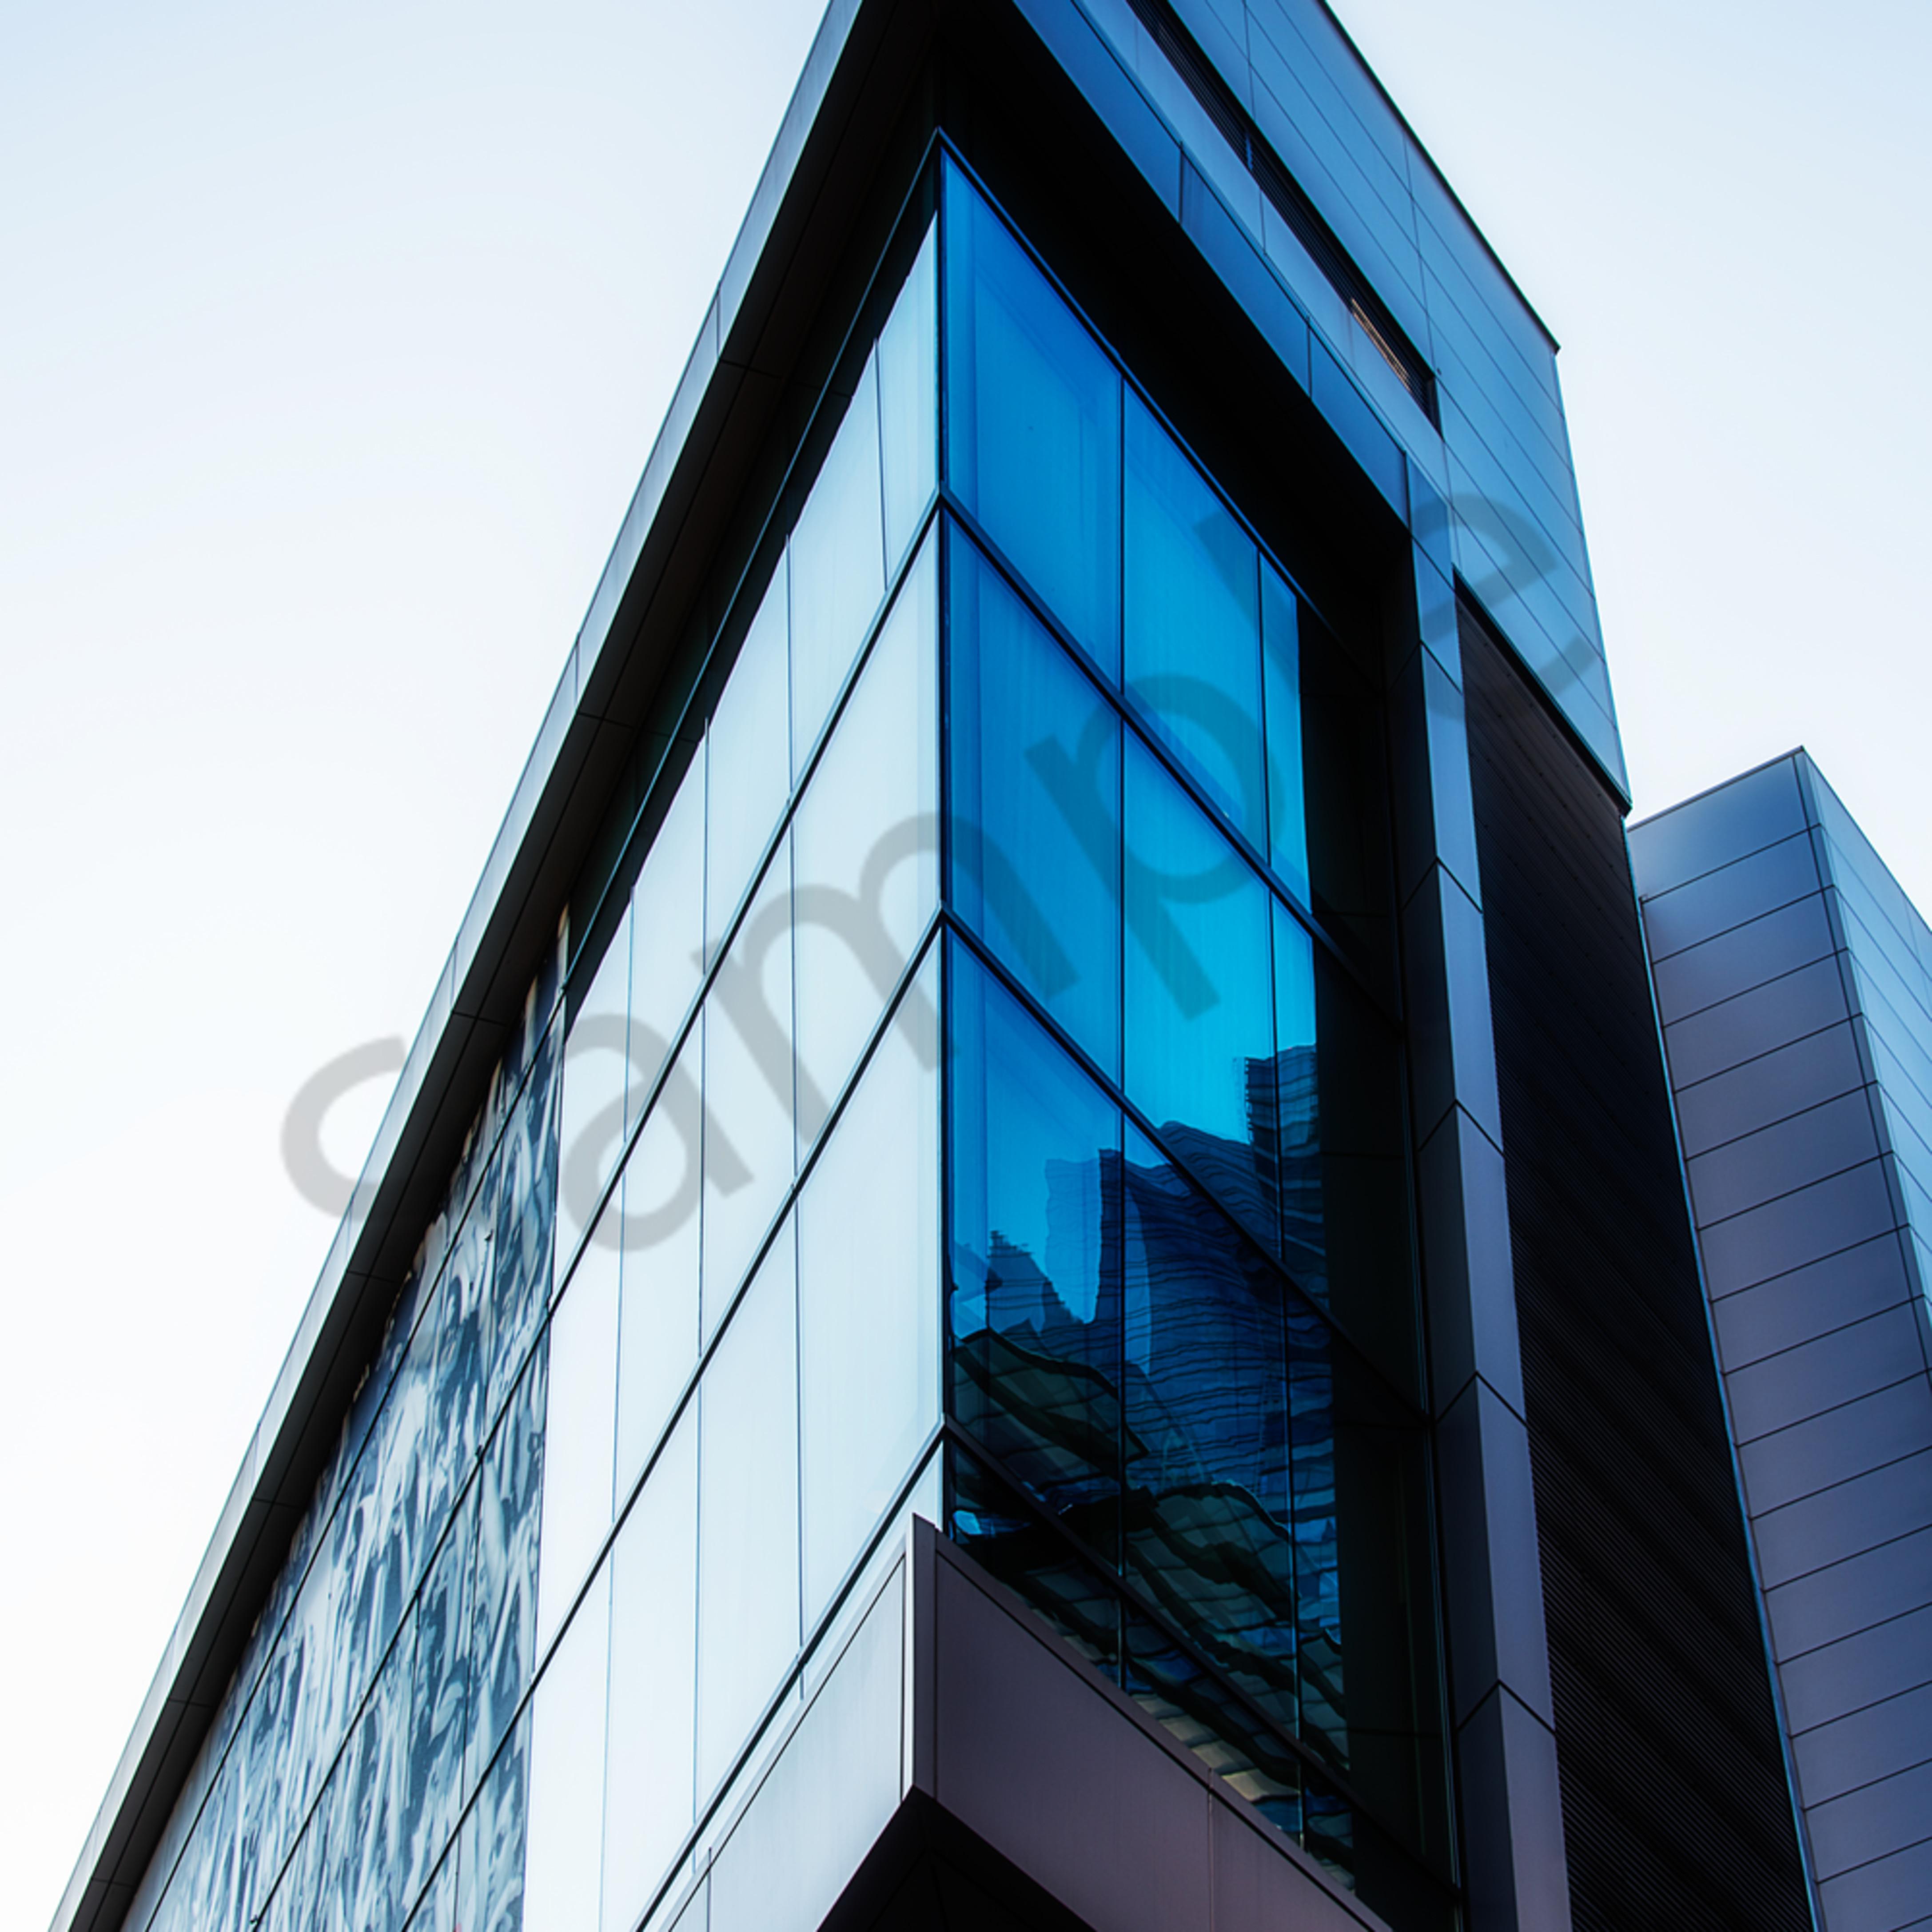 Geometric 01 angular building dsc 0594 j3fdbj